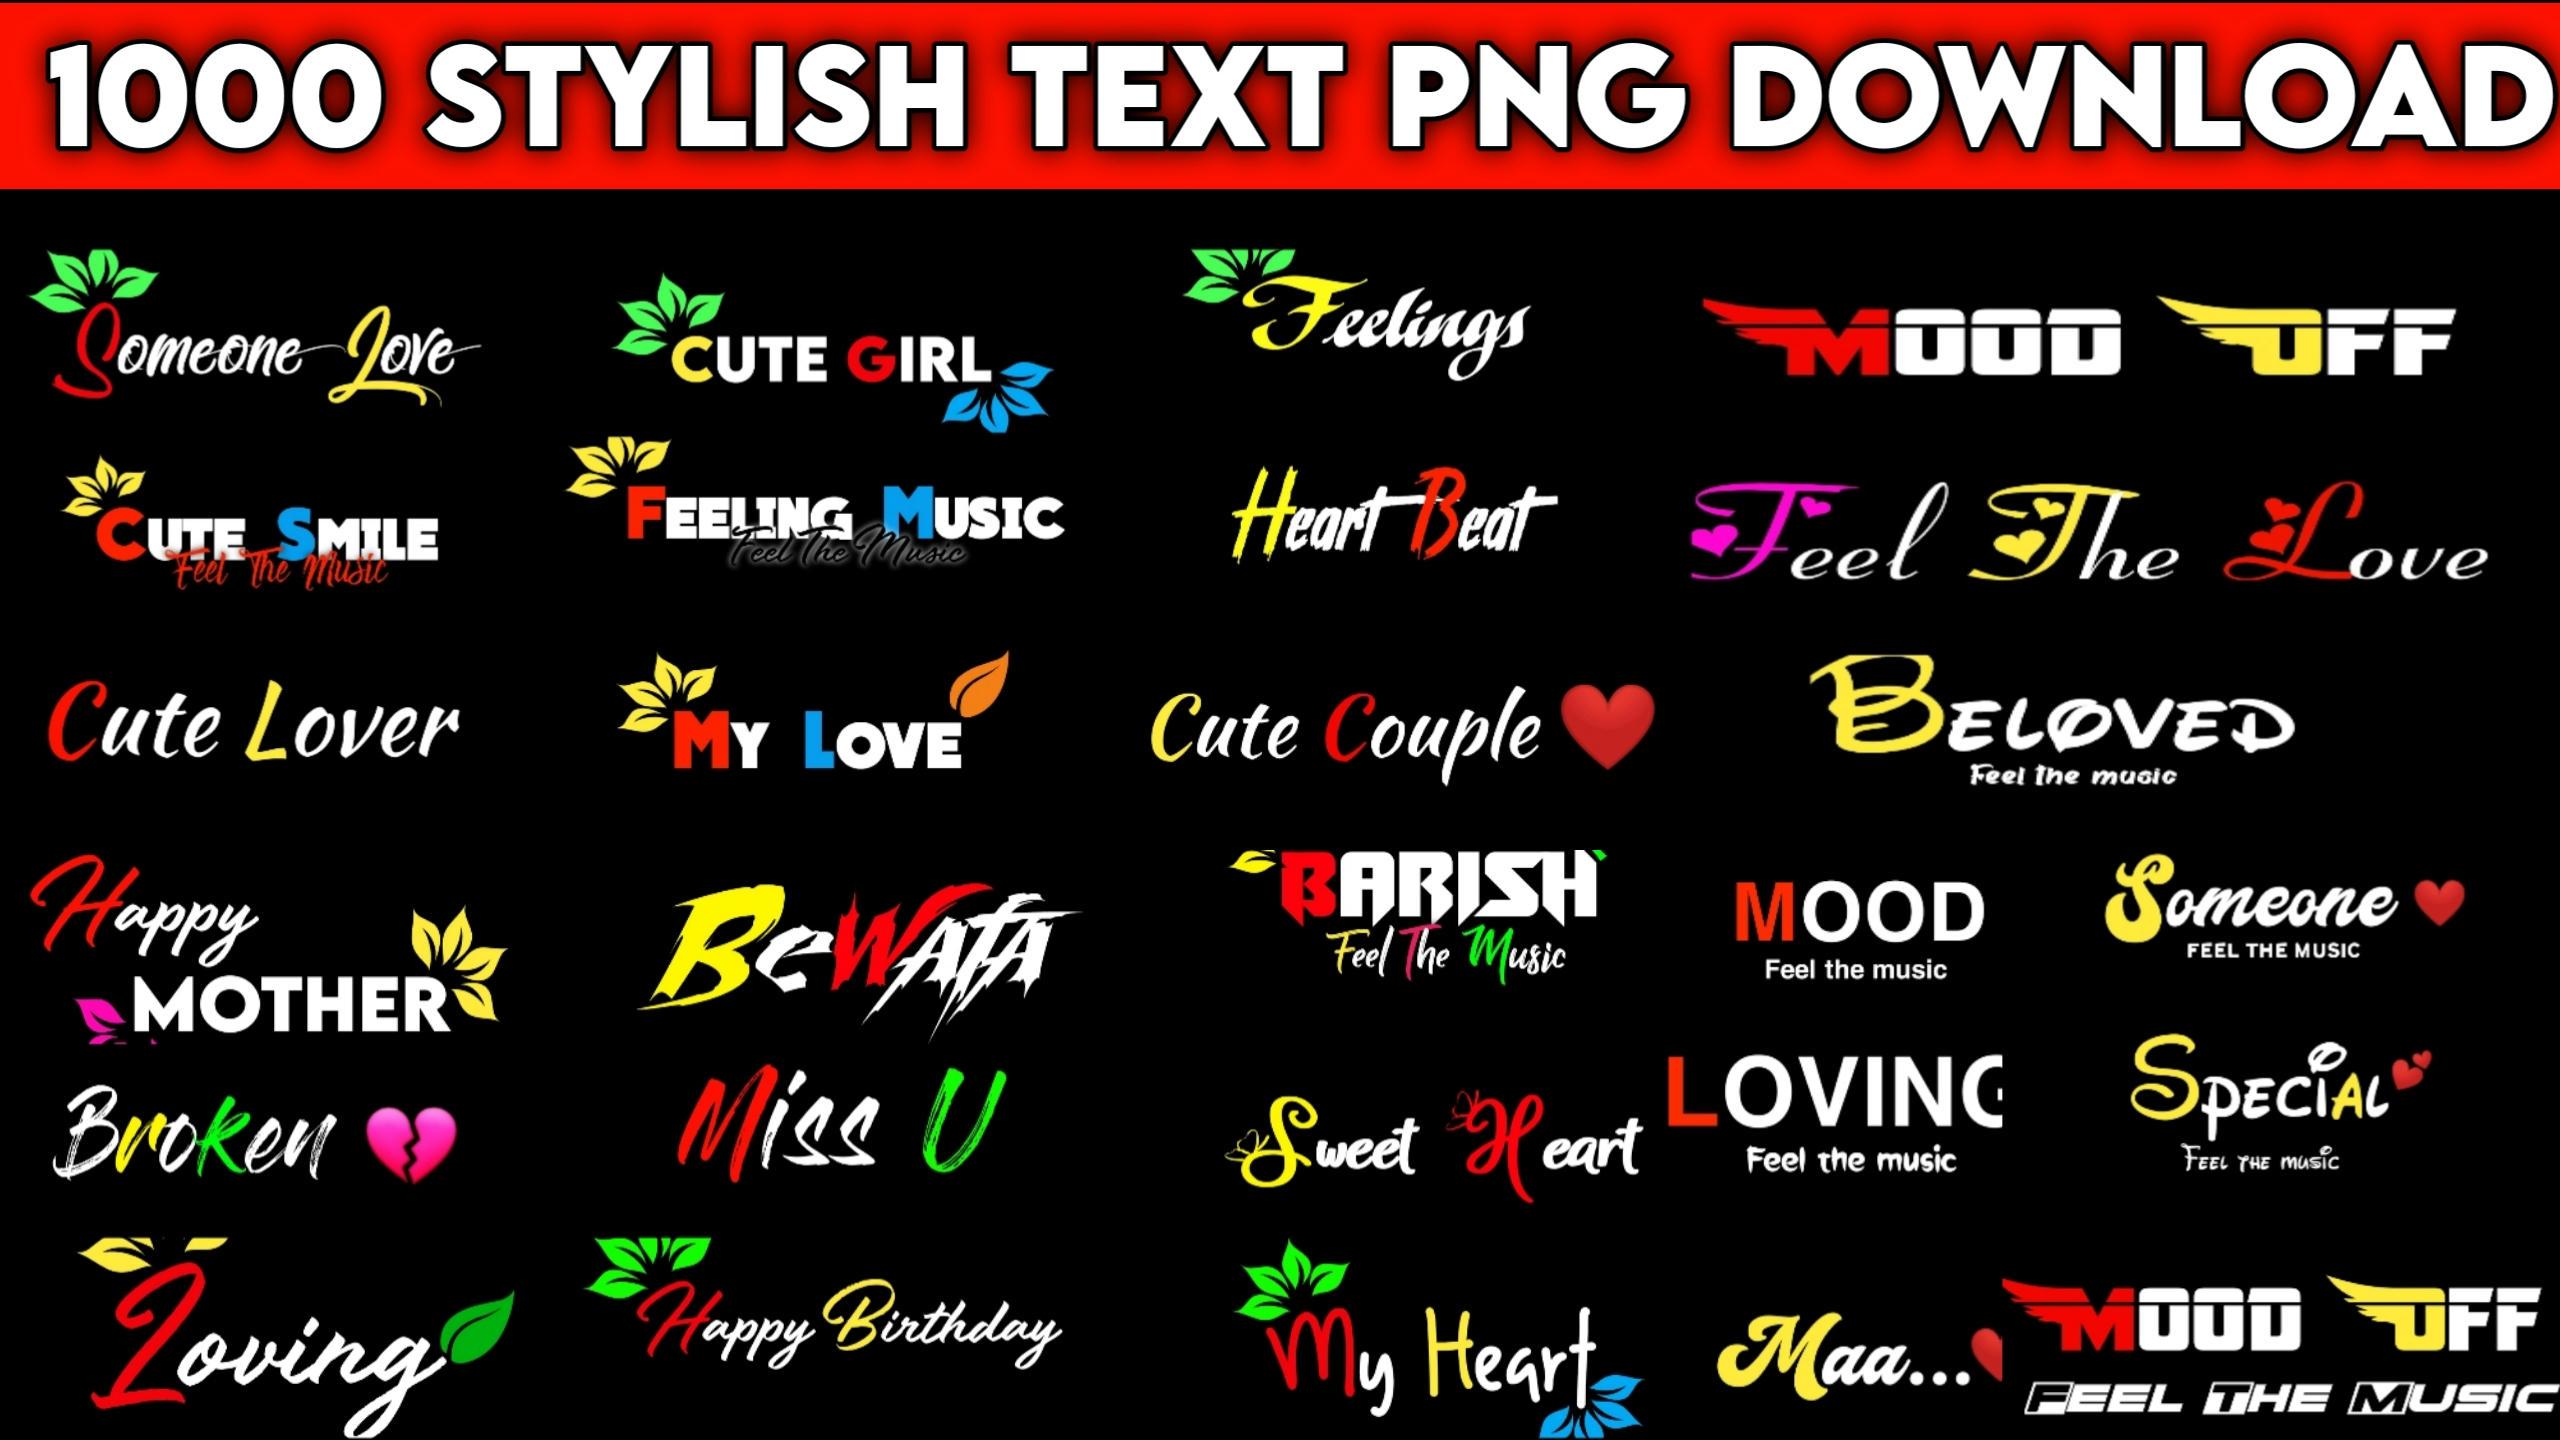 Stylish Text Png Download Free By Dj Devraj Kasya  Use Avee Player And Kinemaster